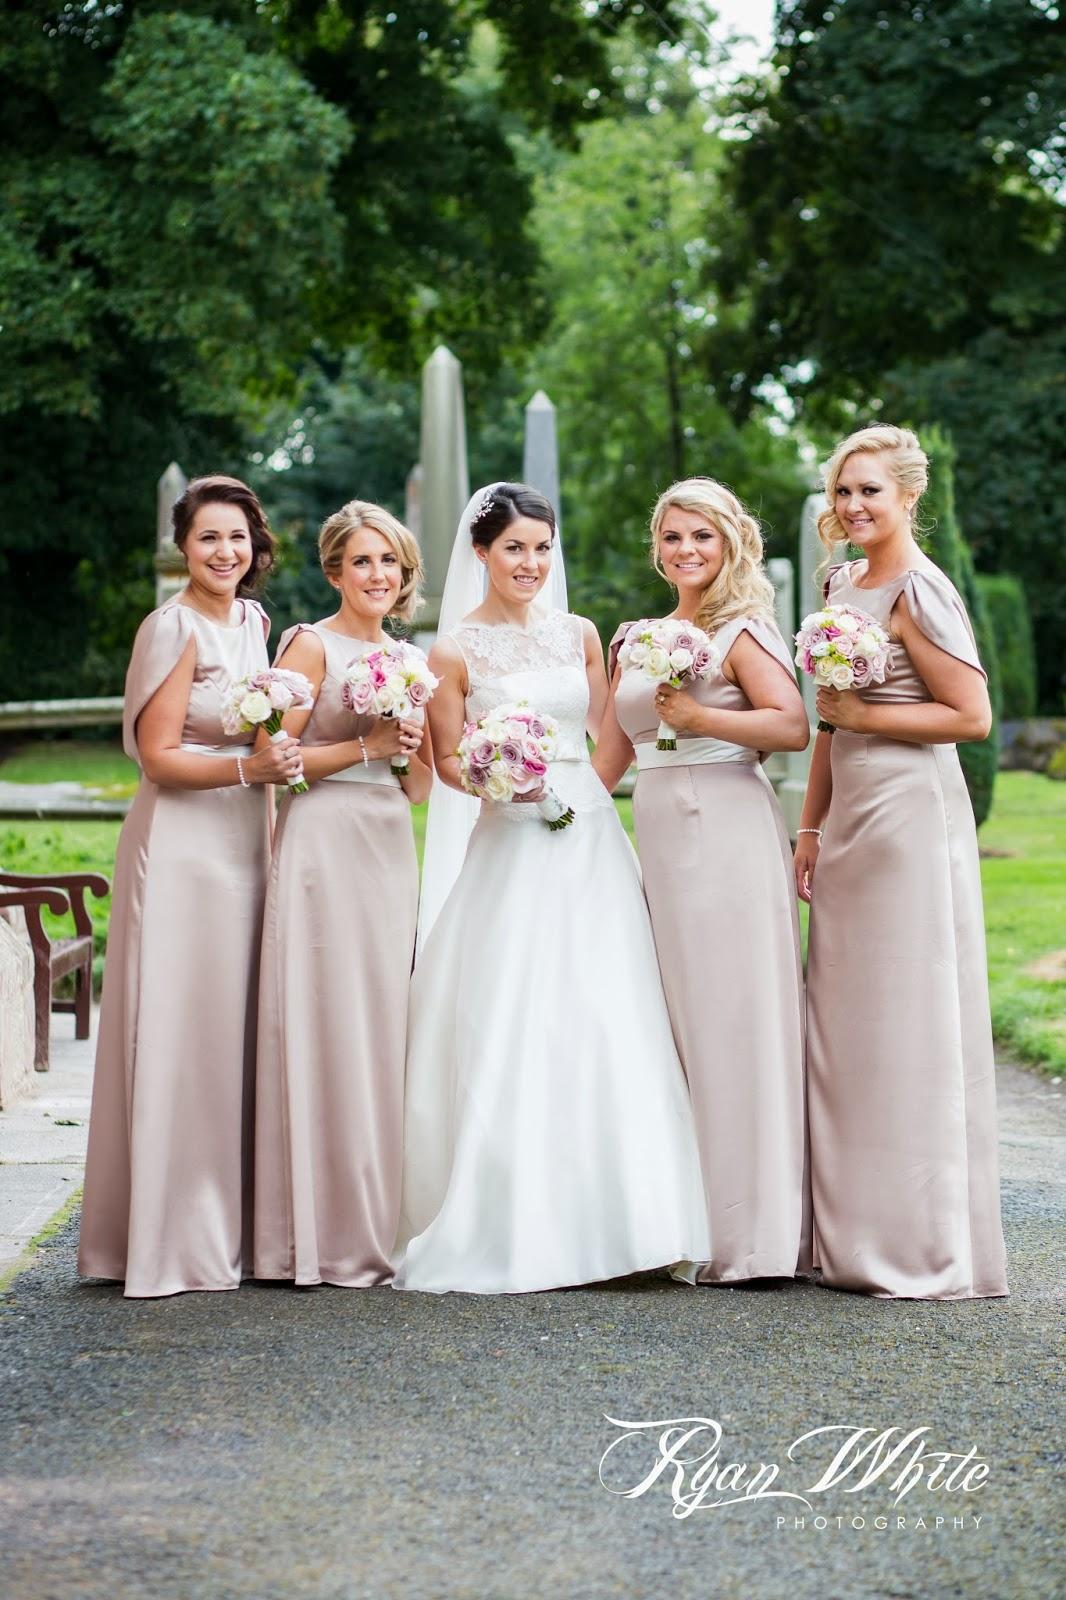 Colour Bridesmaid Dresses